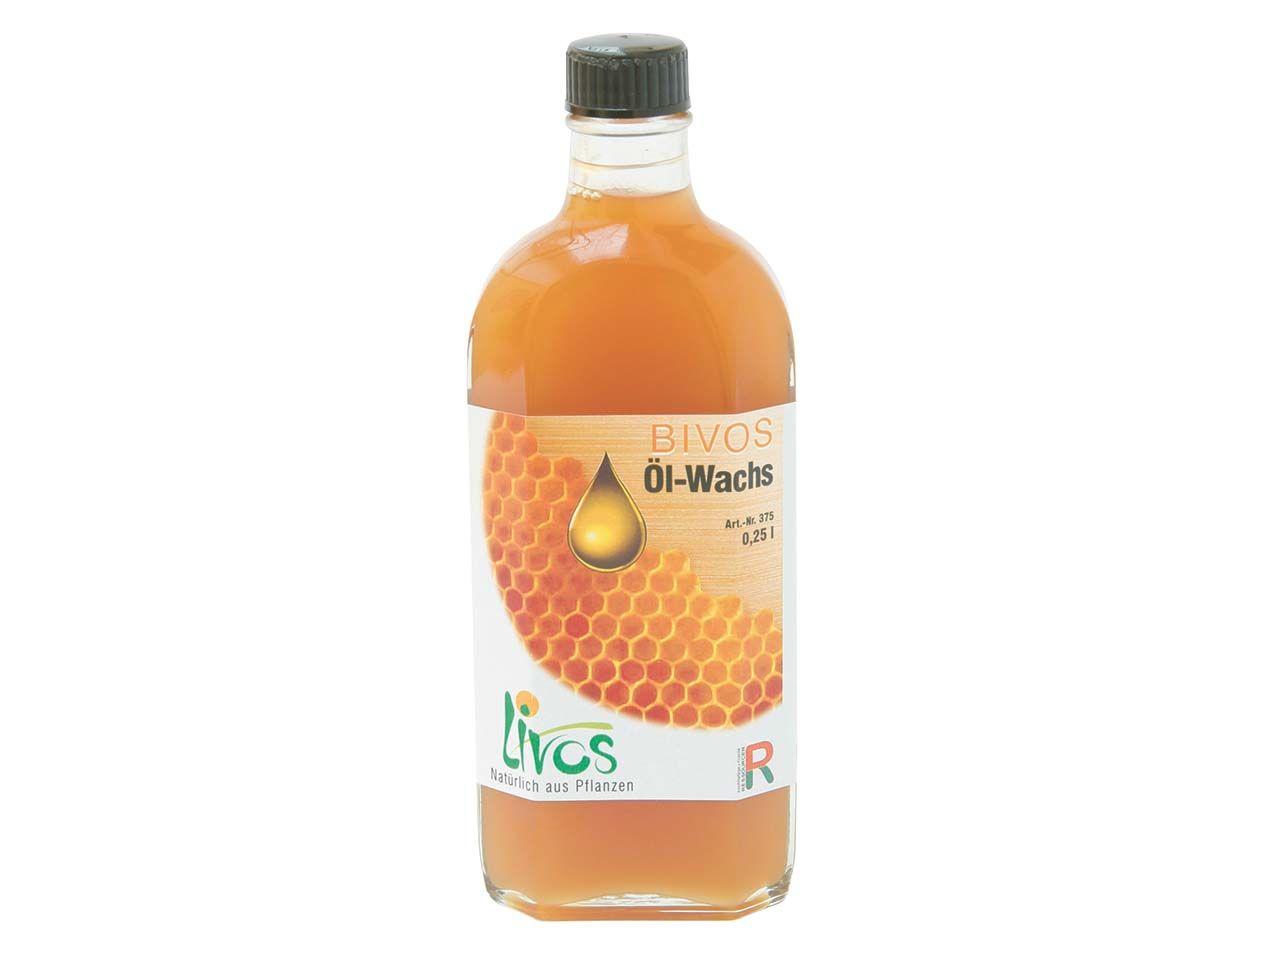 Livos Ölwachs 0,25l 375-0,25